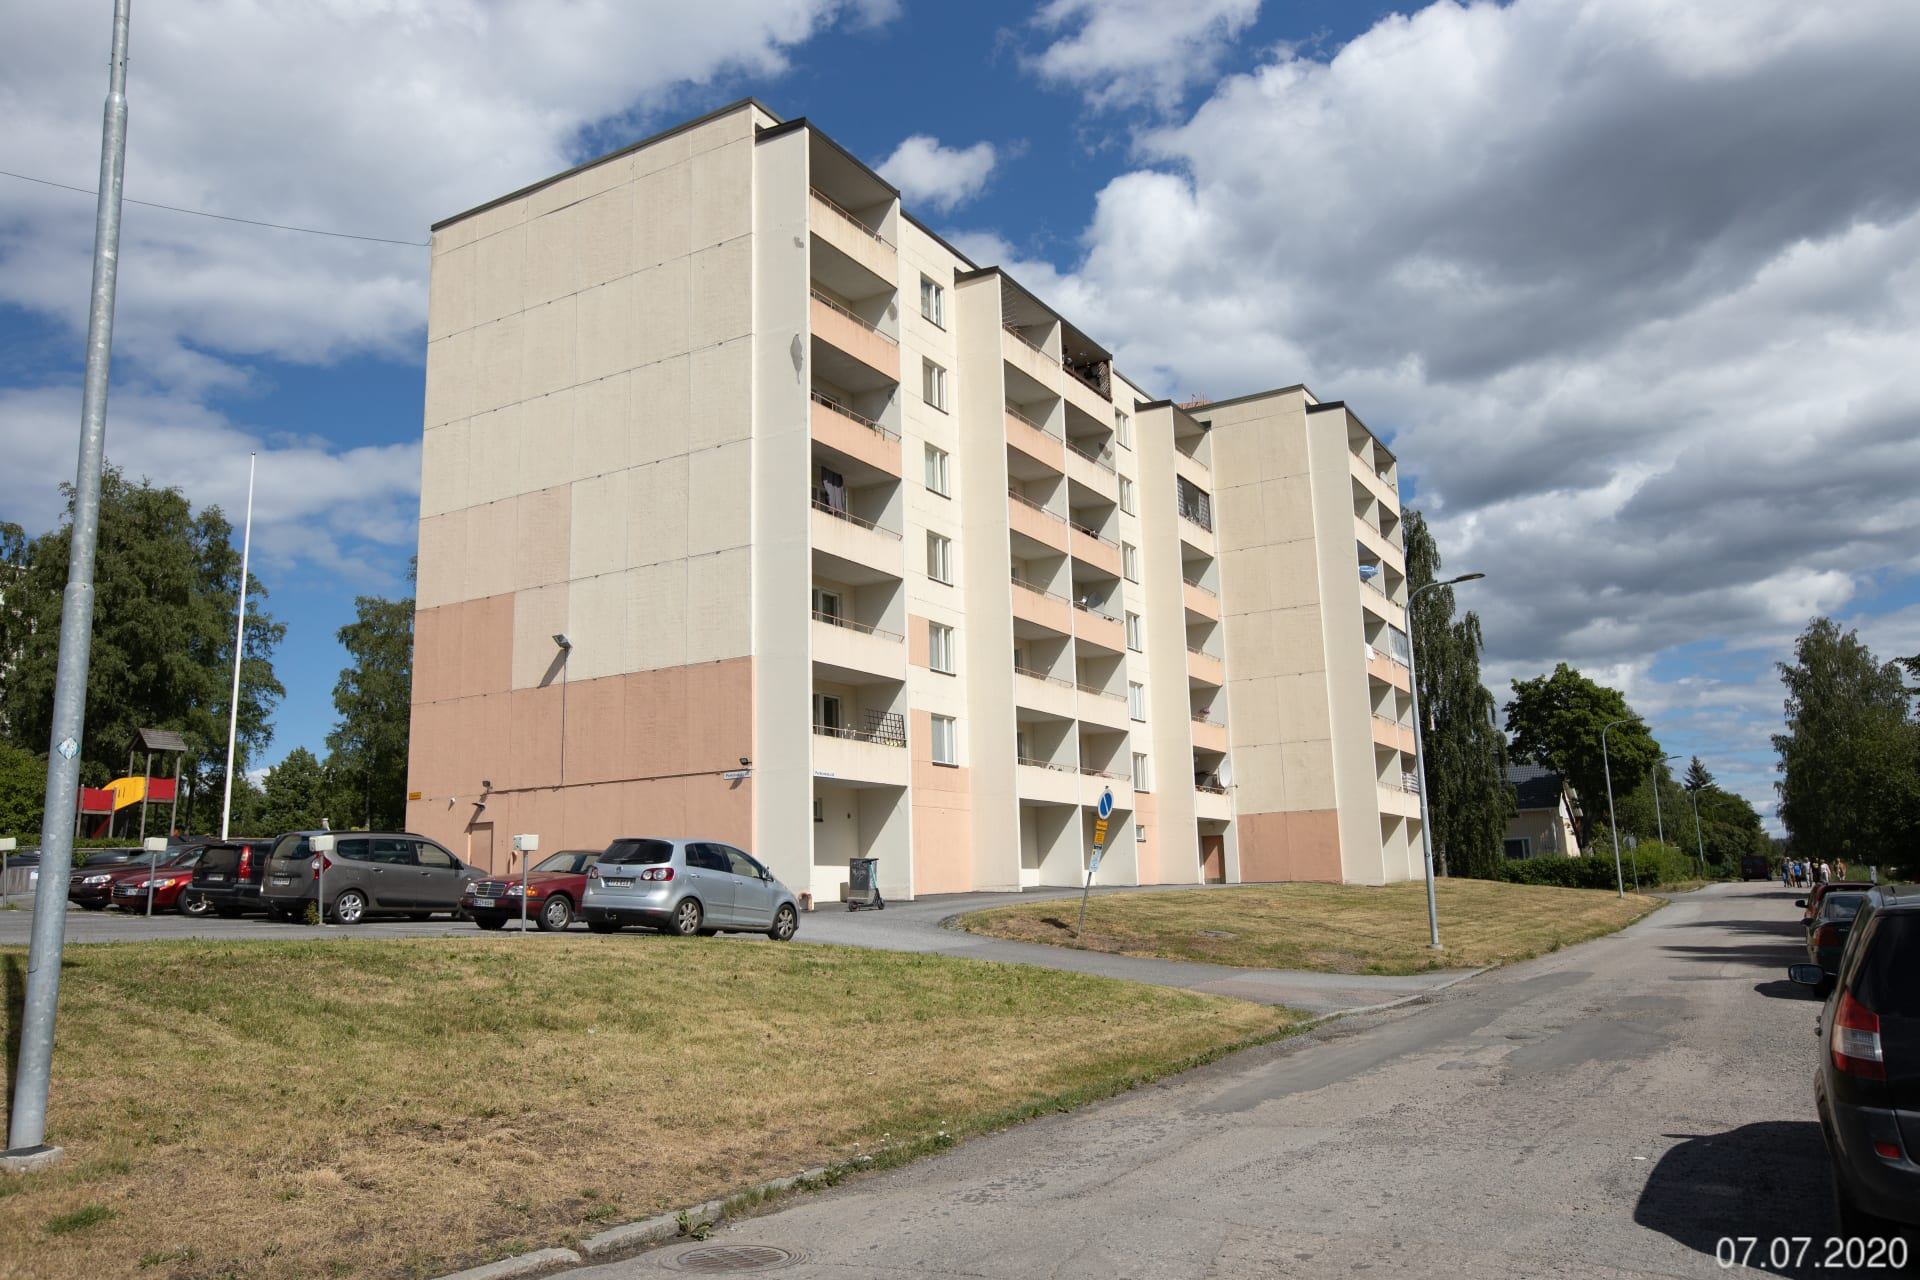 Perkiönkatu Tampere